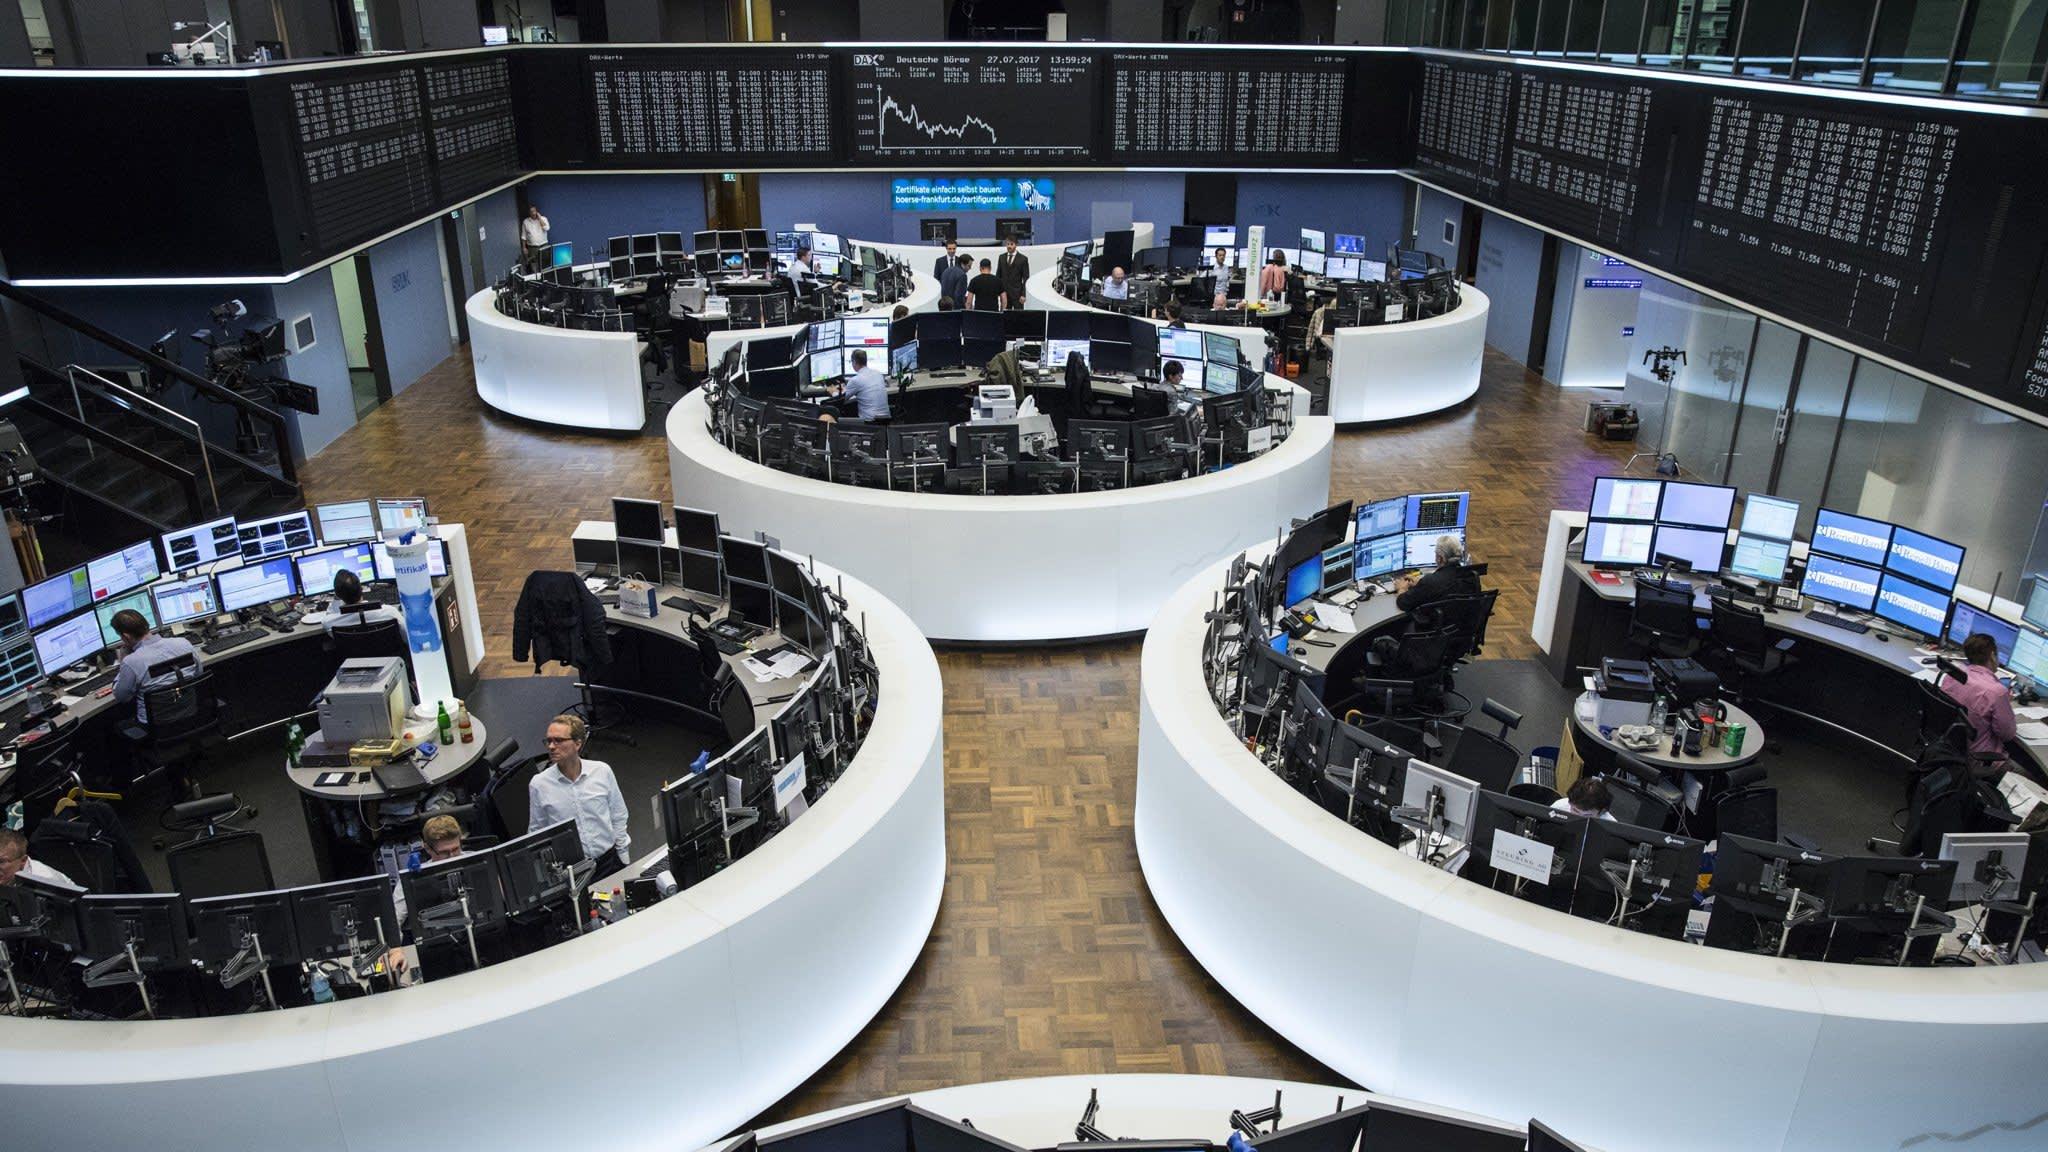 Deutsche Börse equities, futures trading delayed by system glitch